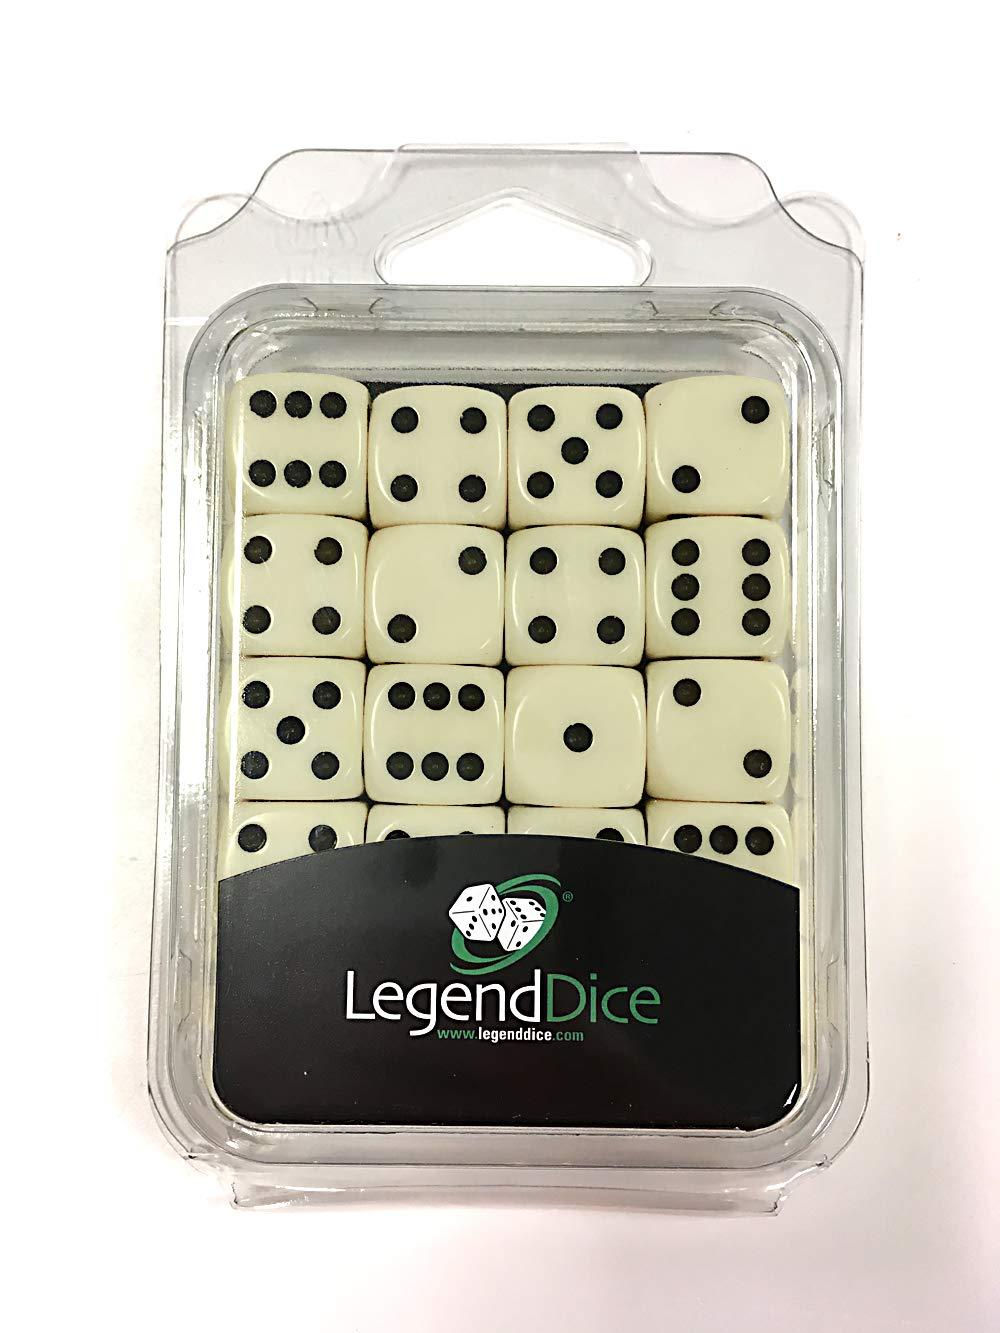 Black // white spots LegendDice 16mm Dice x 20 Retail Packed